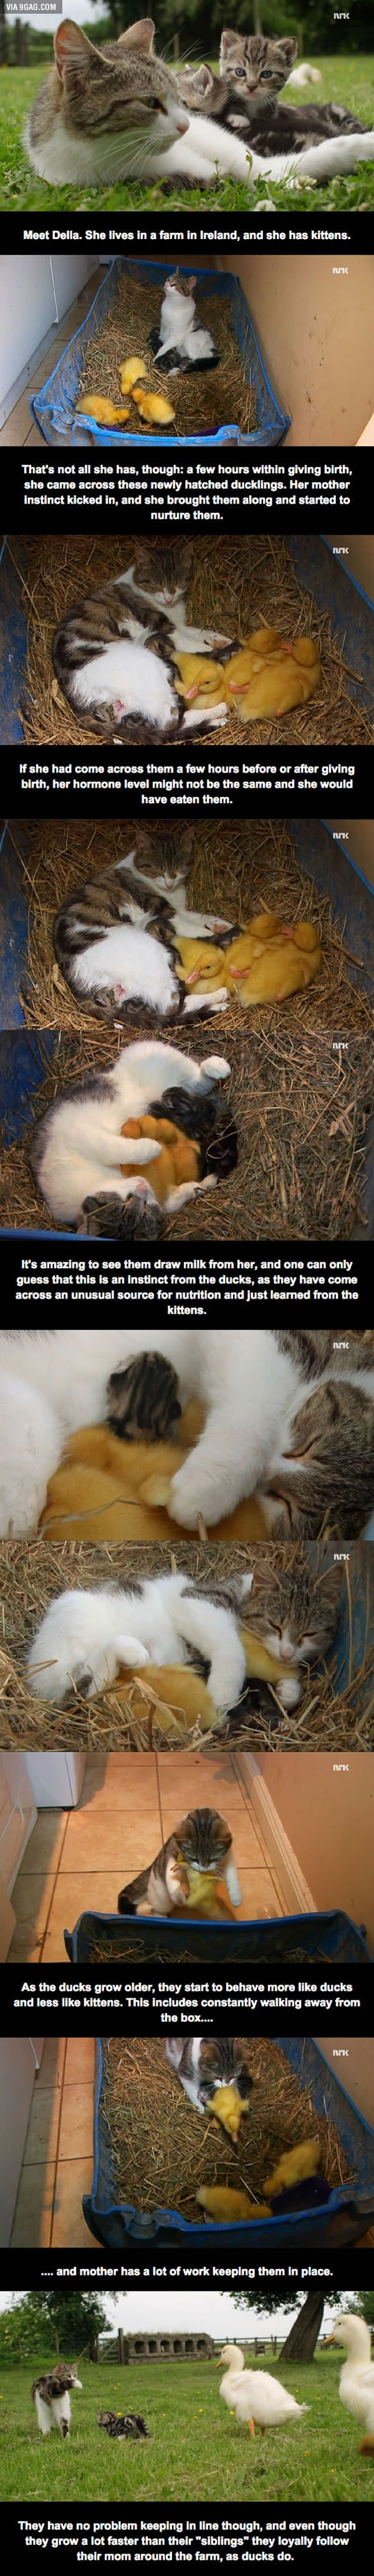 Della, the cat who adopted ducks